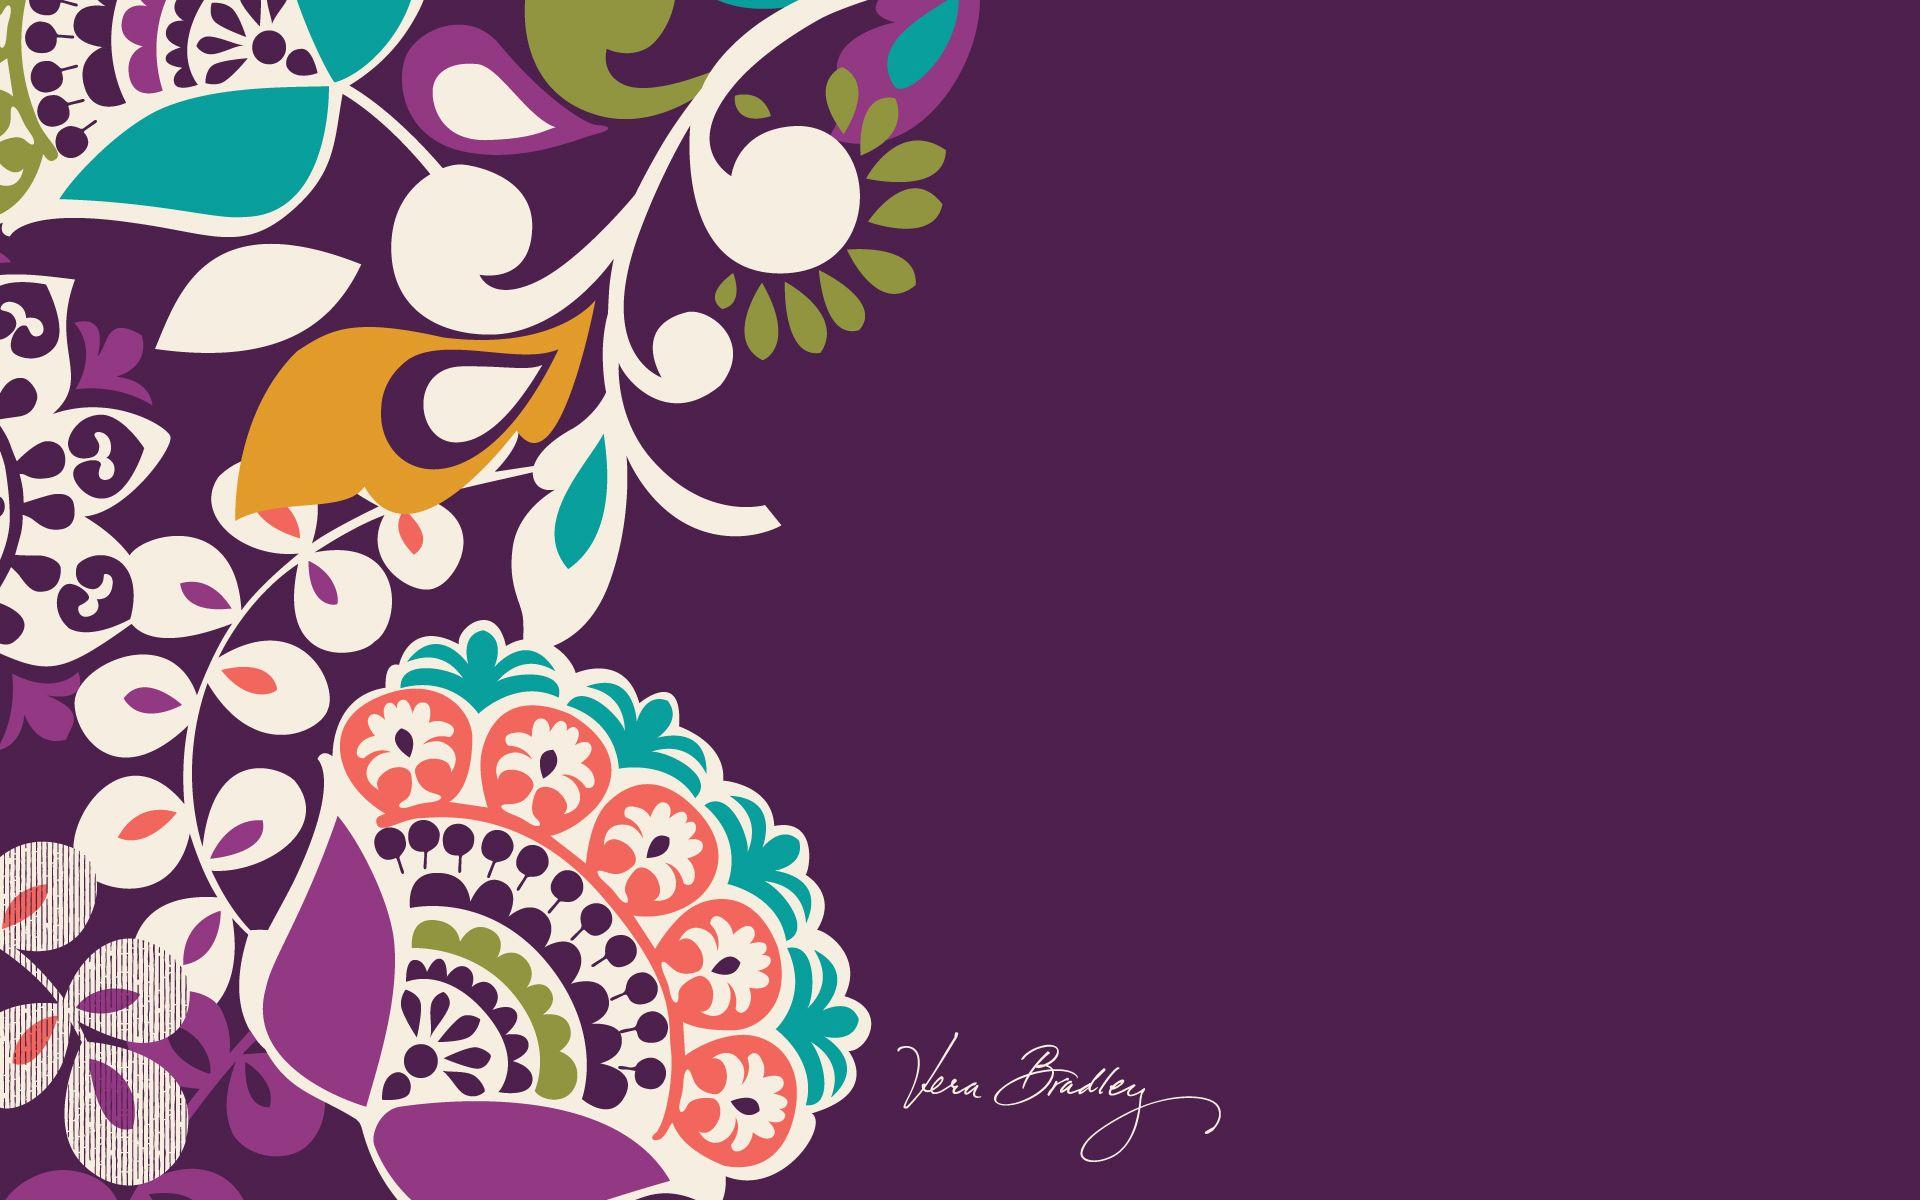 Plum Crazy Vera Bradley Wallpaper Iphone Wallpaper Spring Wallpaper